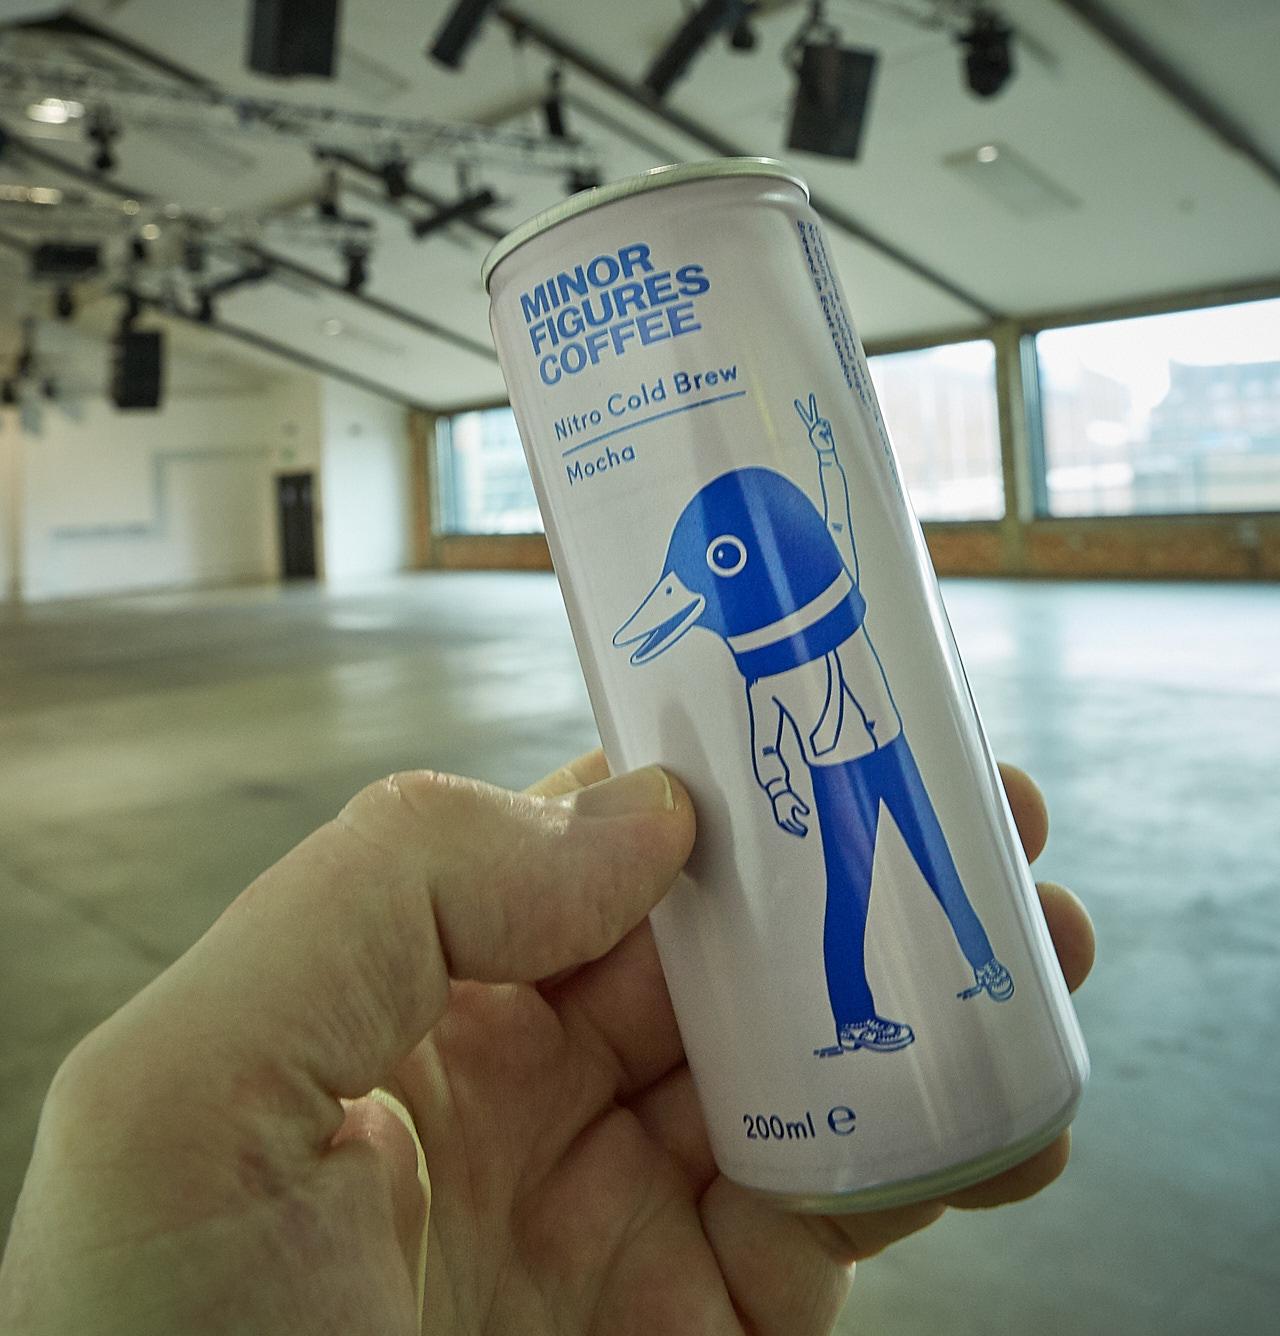 Nitro coffee in a can